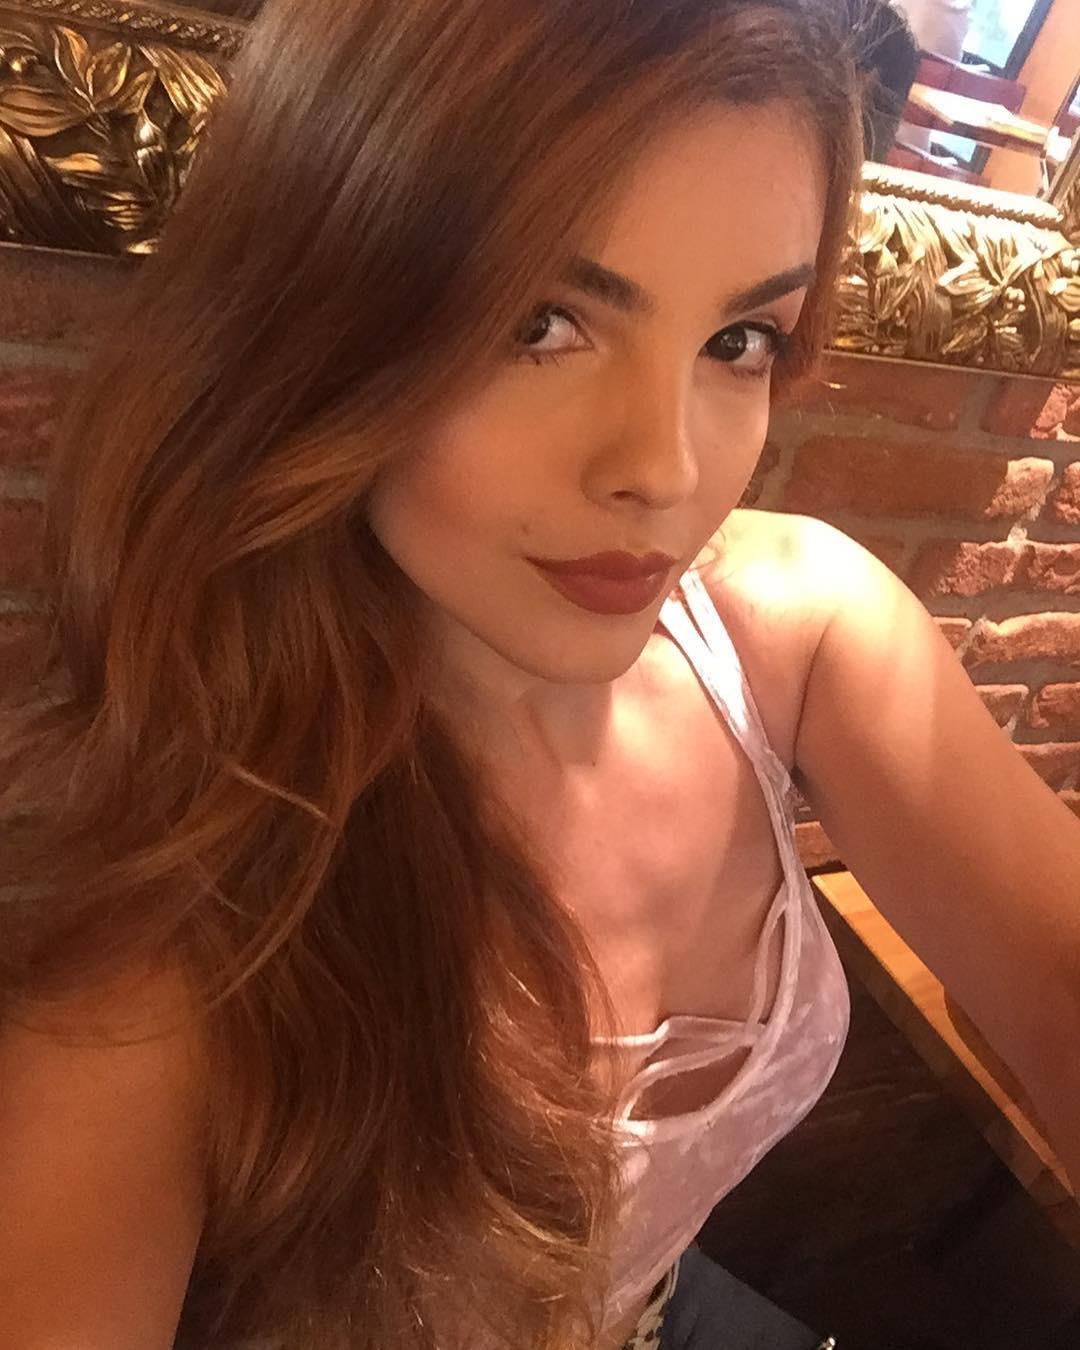 nathalie de oliveira, miss bom jardim 2019/1st runner-up de miss international queen 2016. - Página 3 37984910